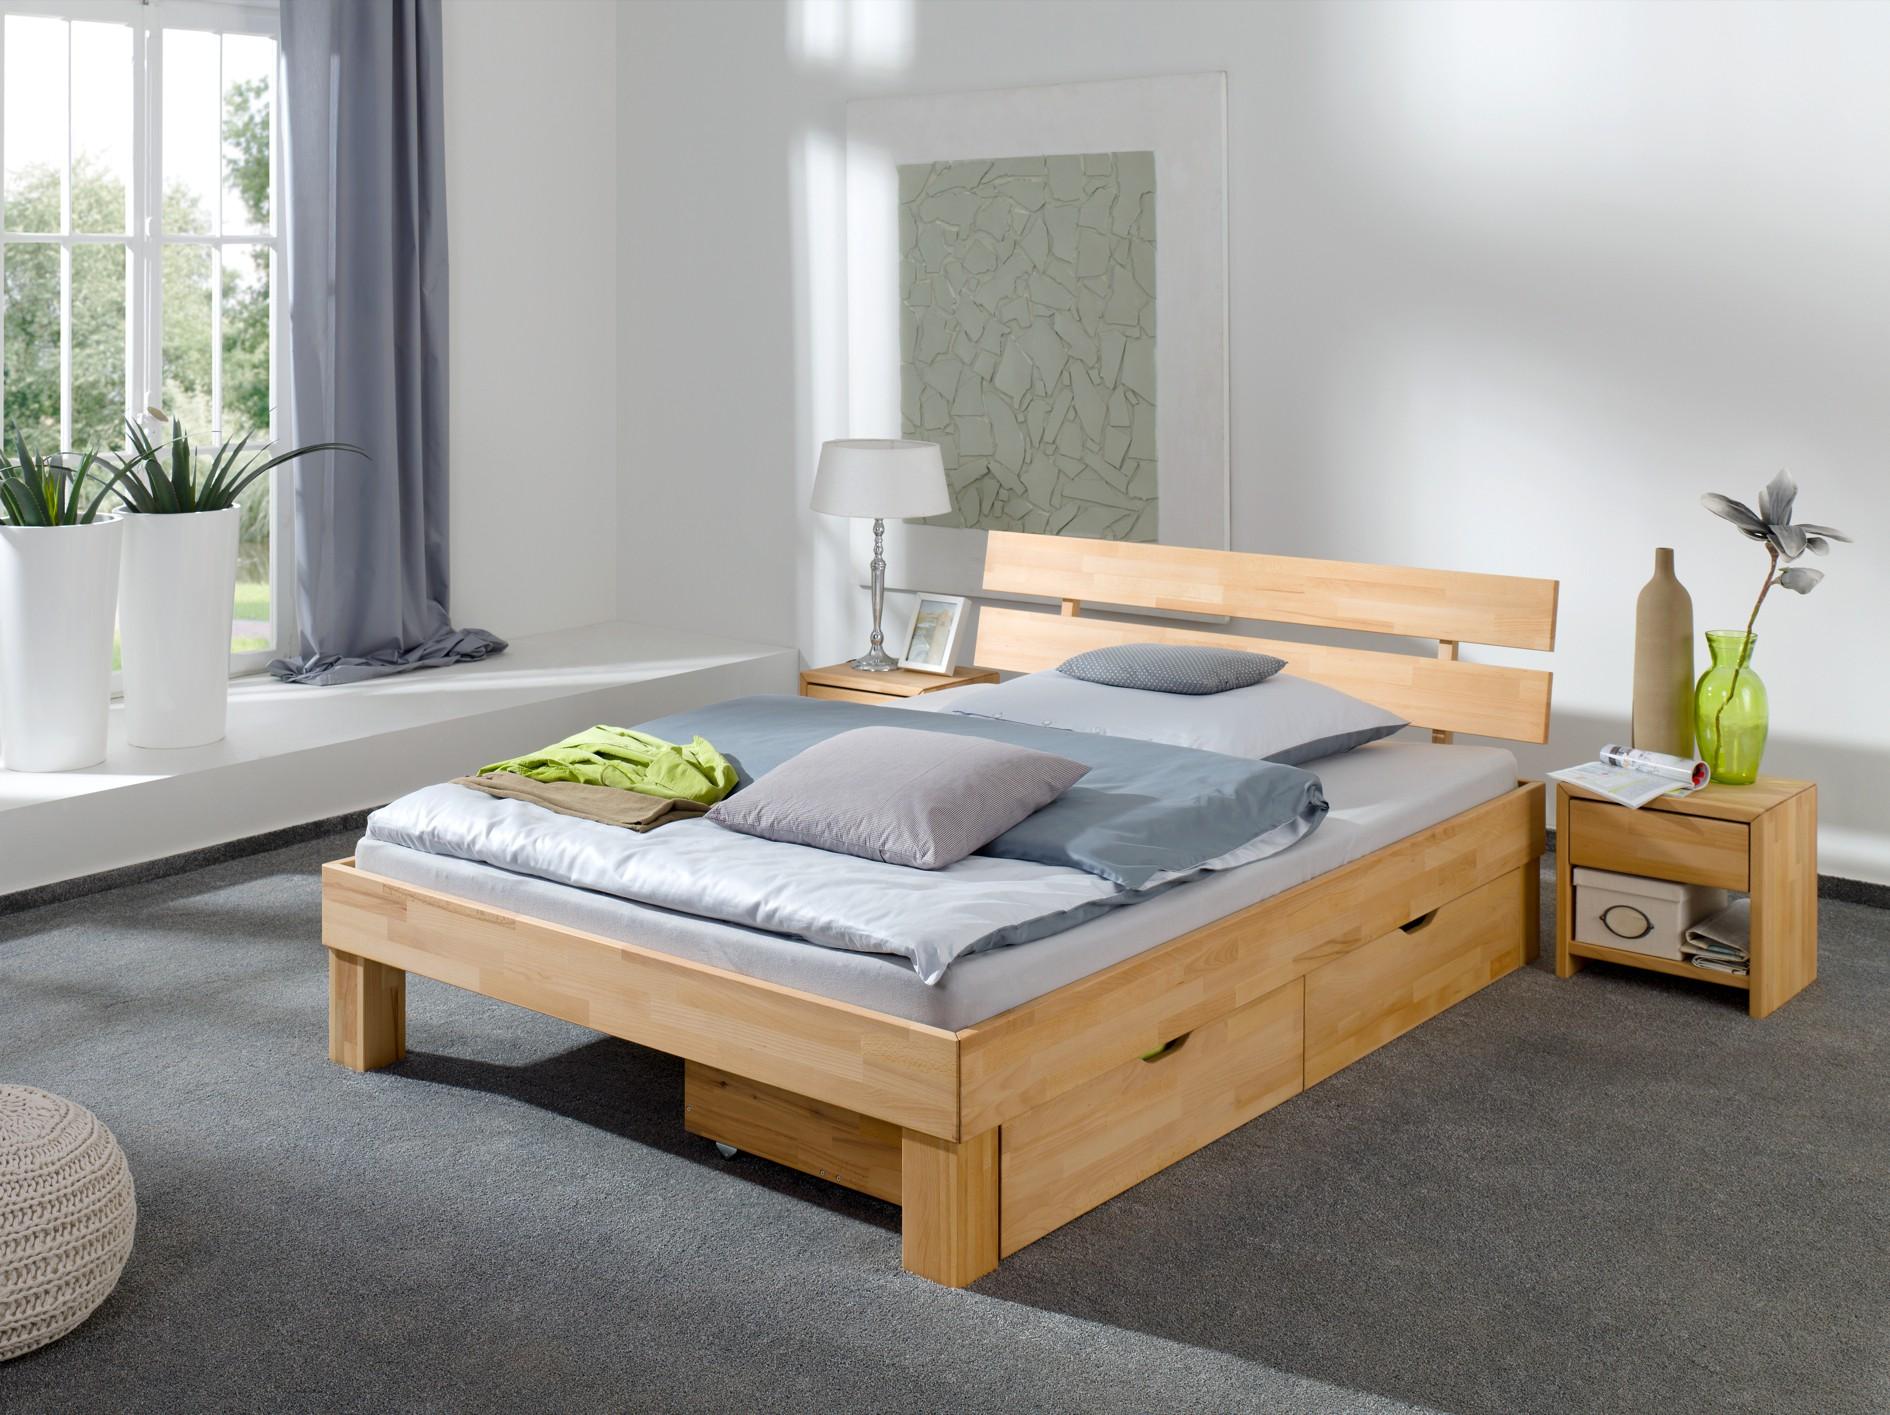 Inspirierend Bettkasten Bett Beste Wahl 60.86-18 B33 Doppel-bett 180x200 Buche Massiv Ehebett